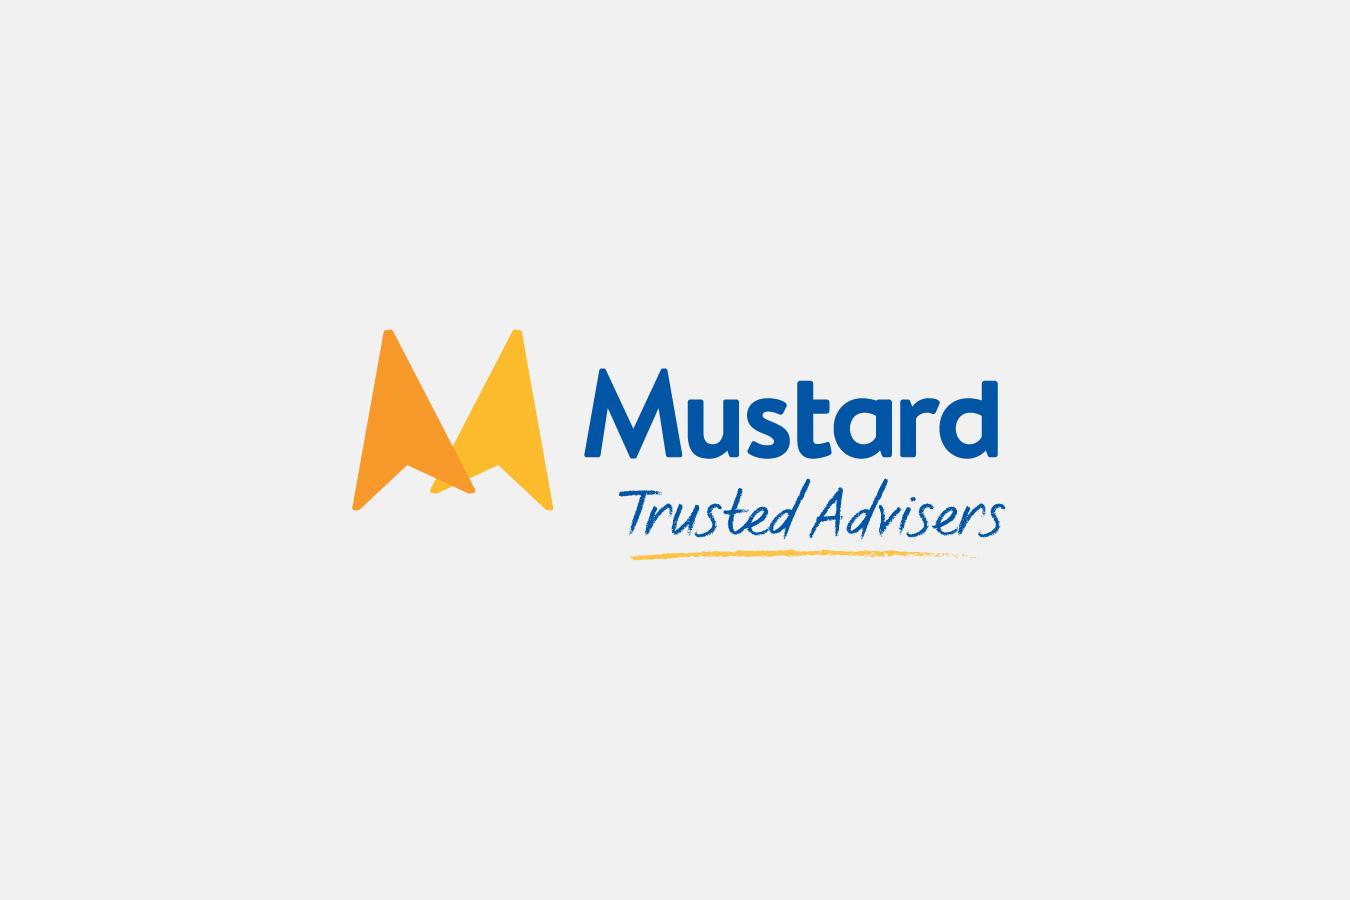 mustard-business-advisory-hdd